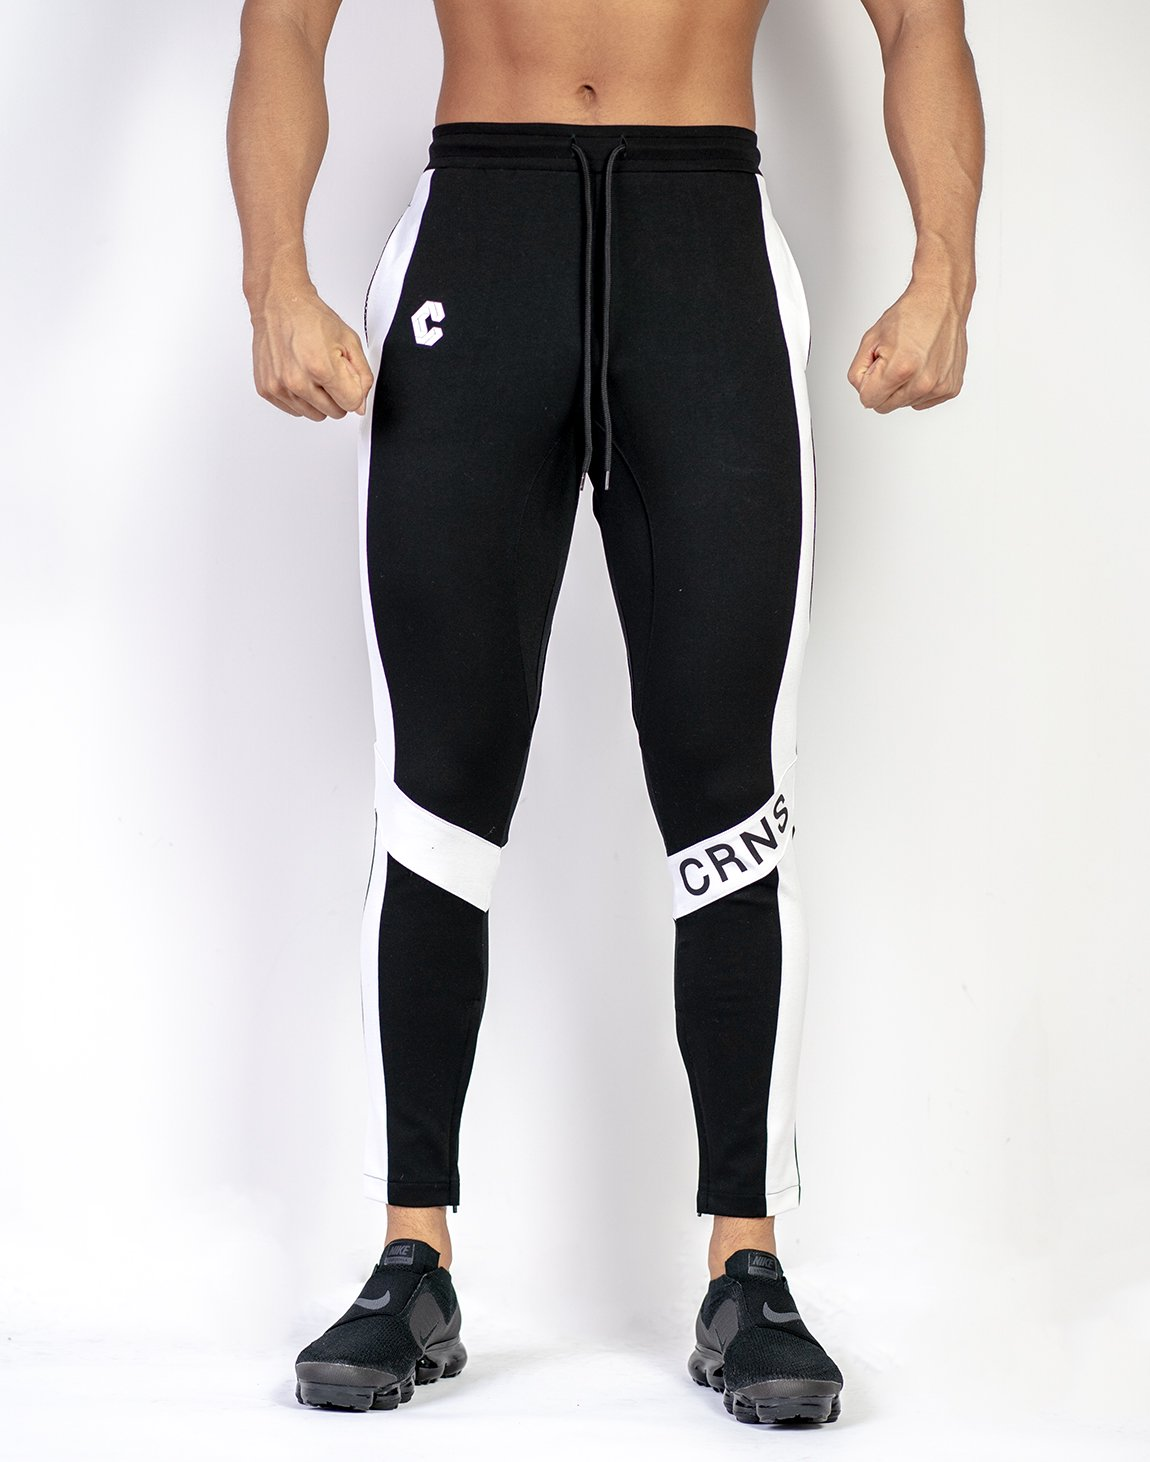 CRNS Knee logo Pants  BLACK